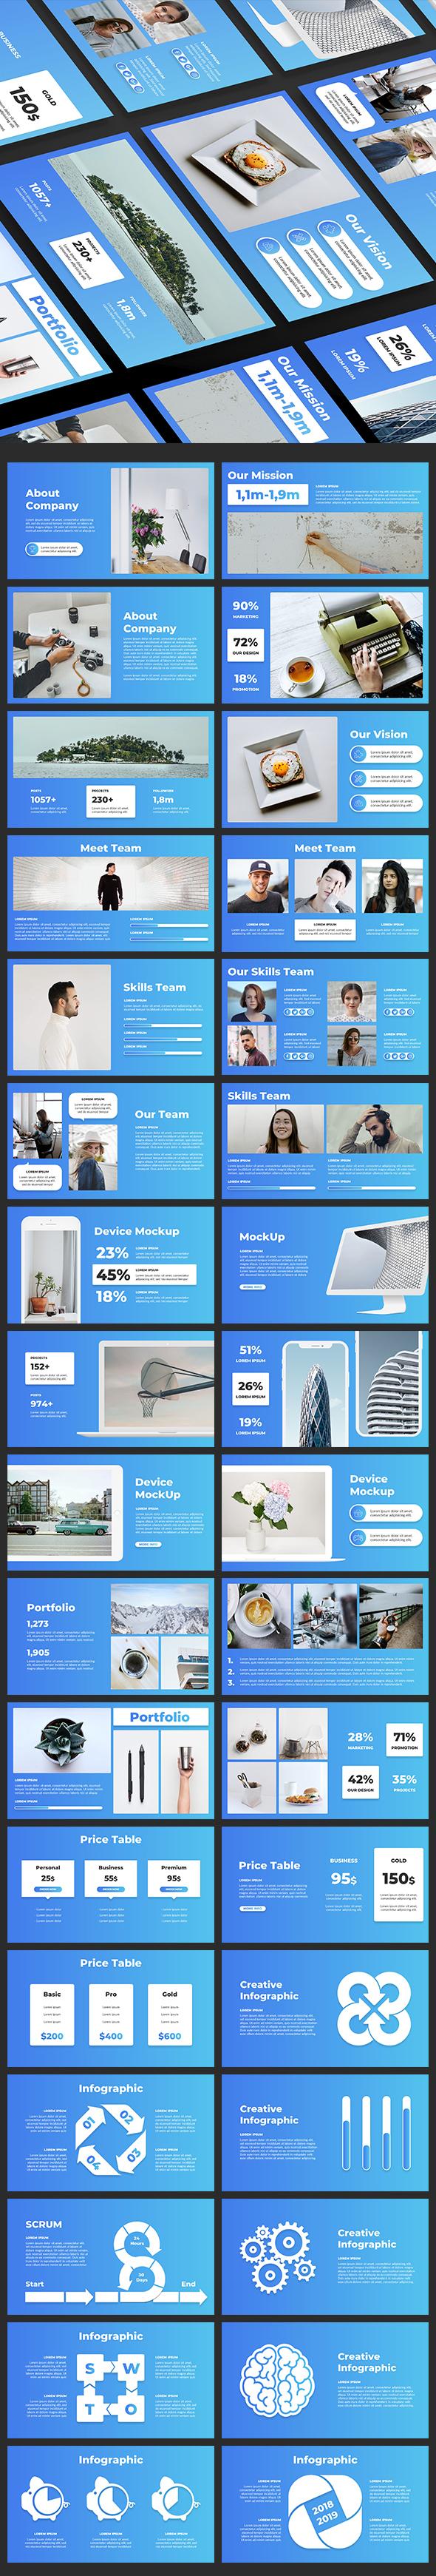 Pitch Deck Keynote Presentation - Business Keynote Templates